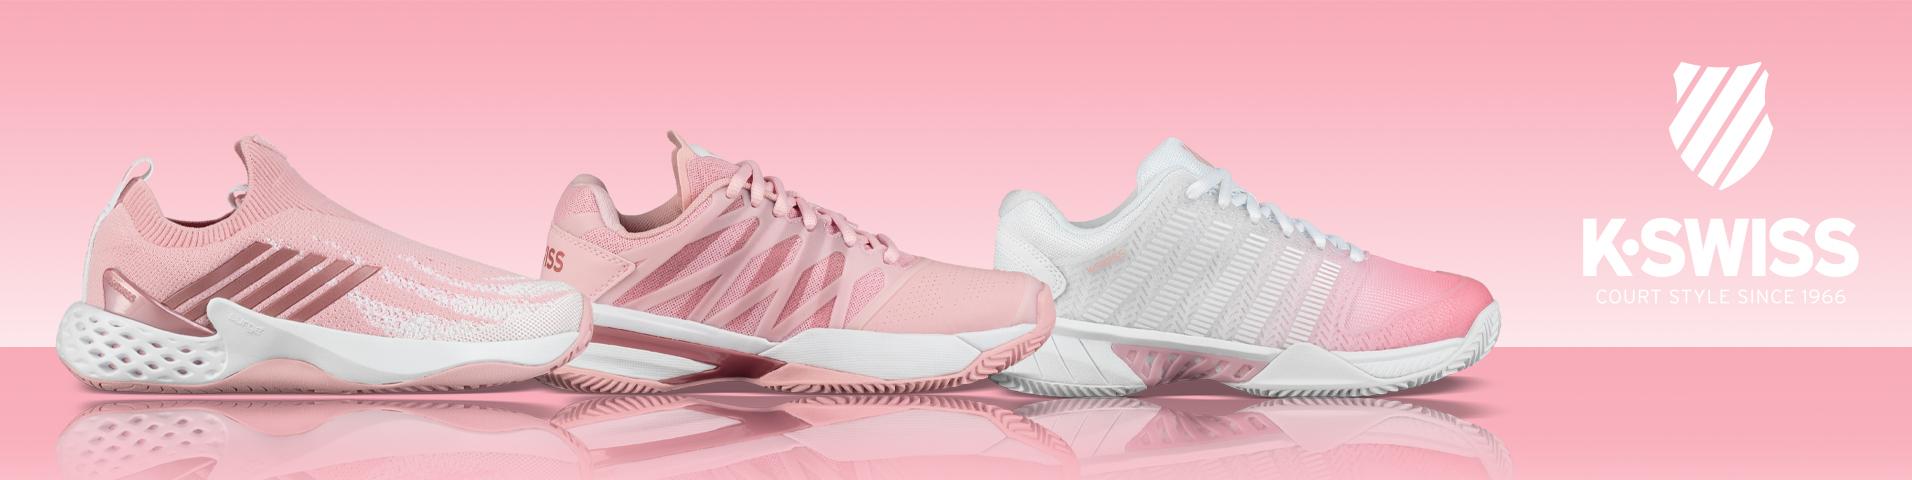 K SWISS Sportschuhe für Damen | Bei den Schuhen fängt es an